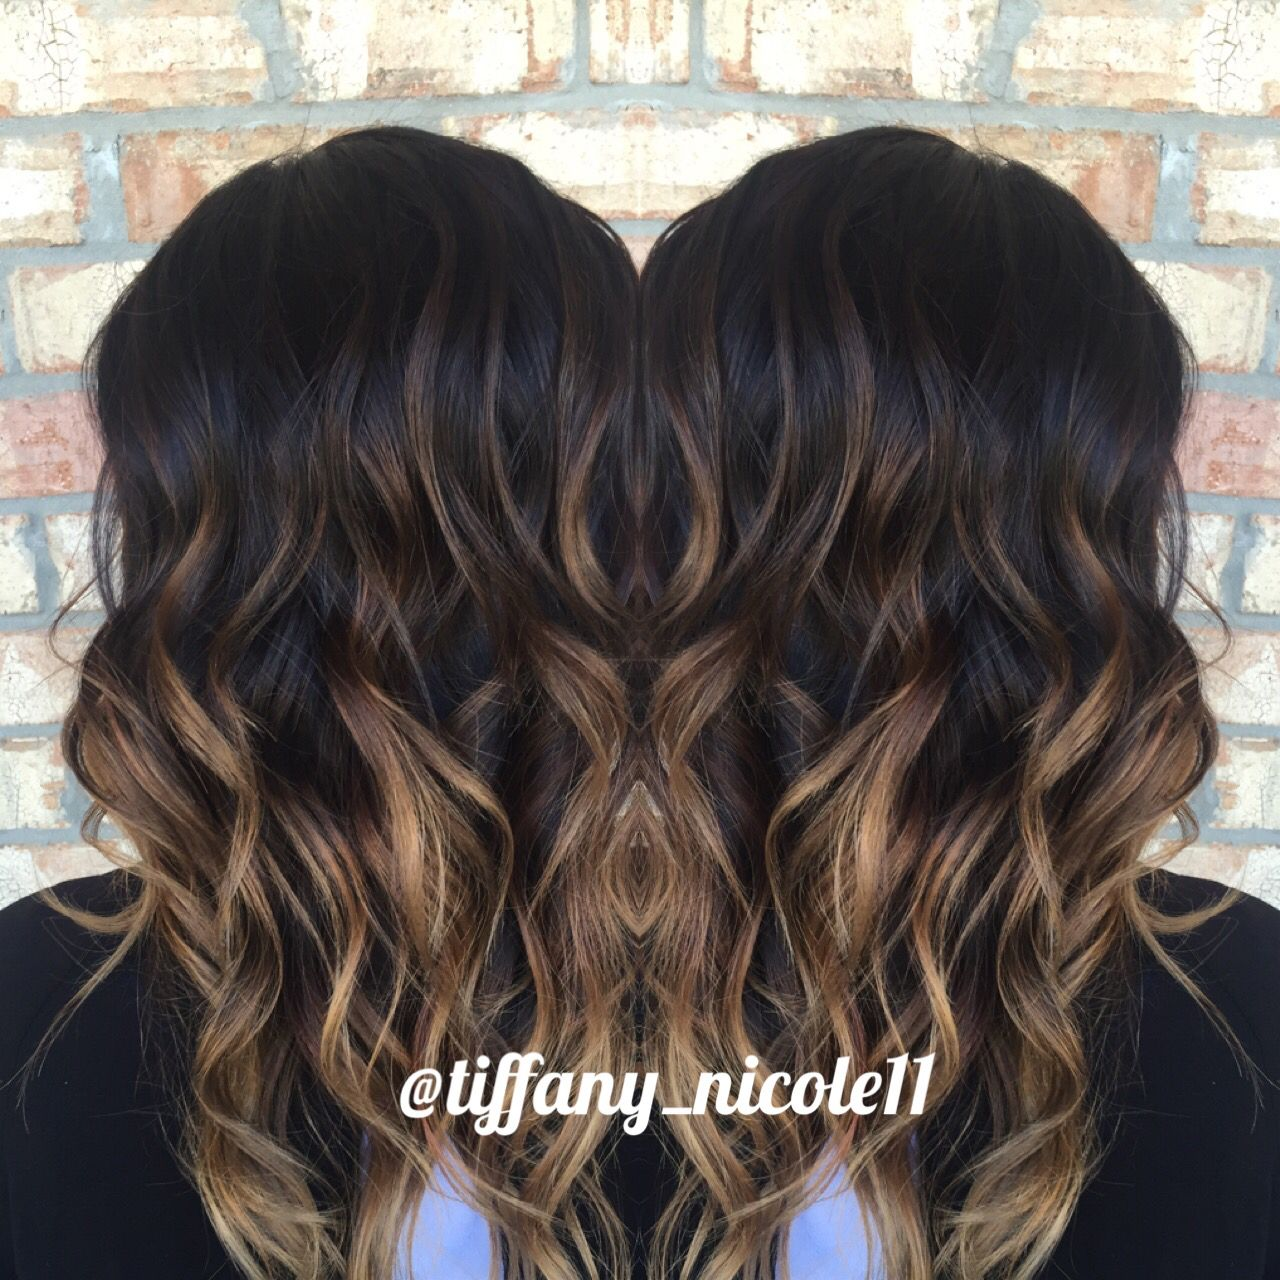 Hair dark with light brown tips photos